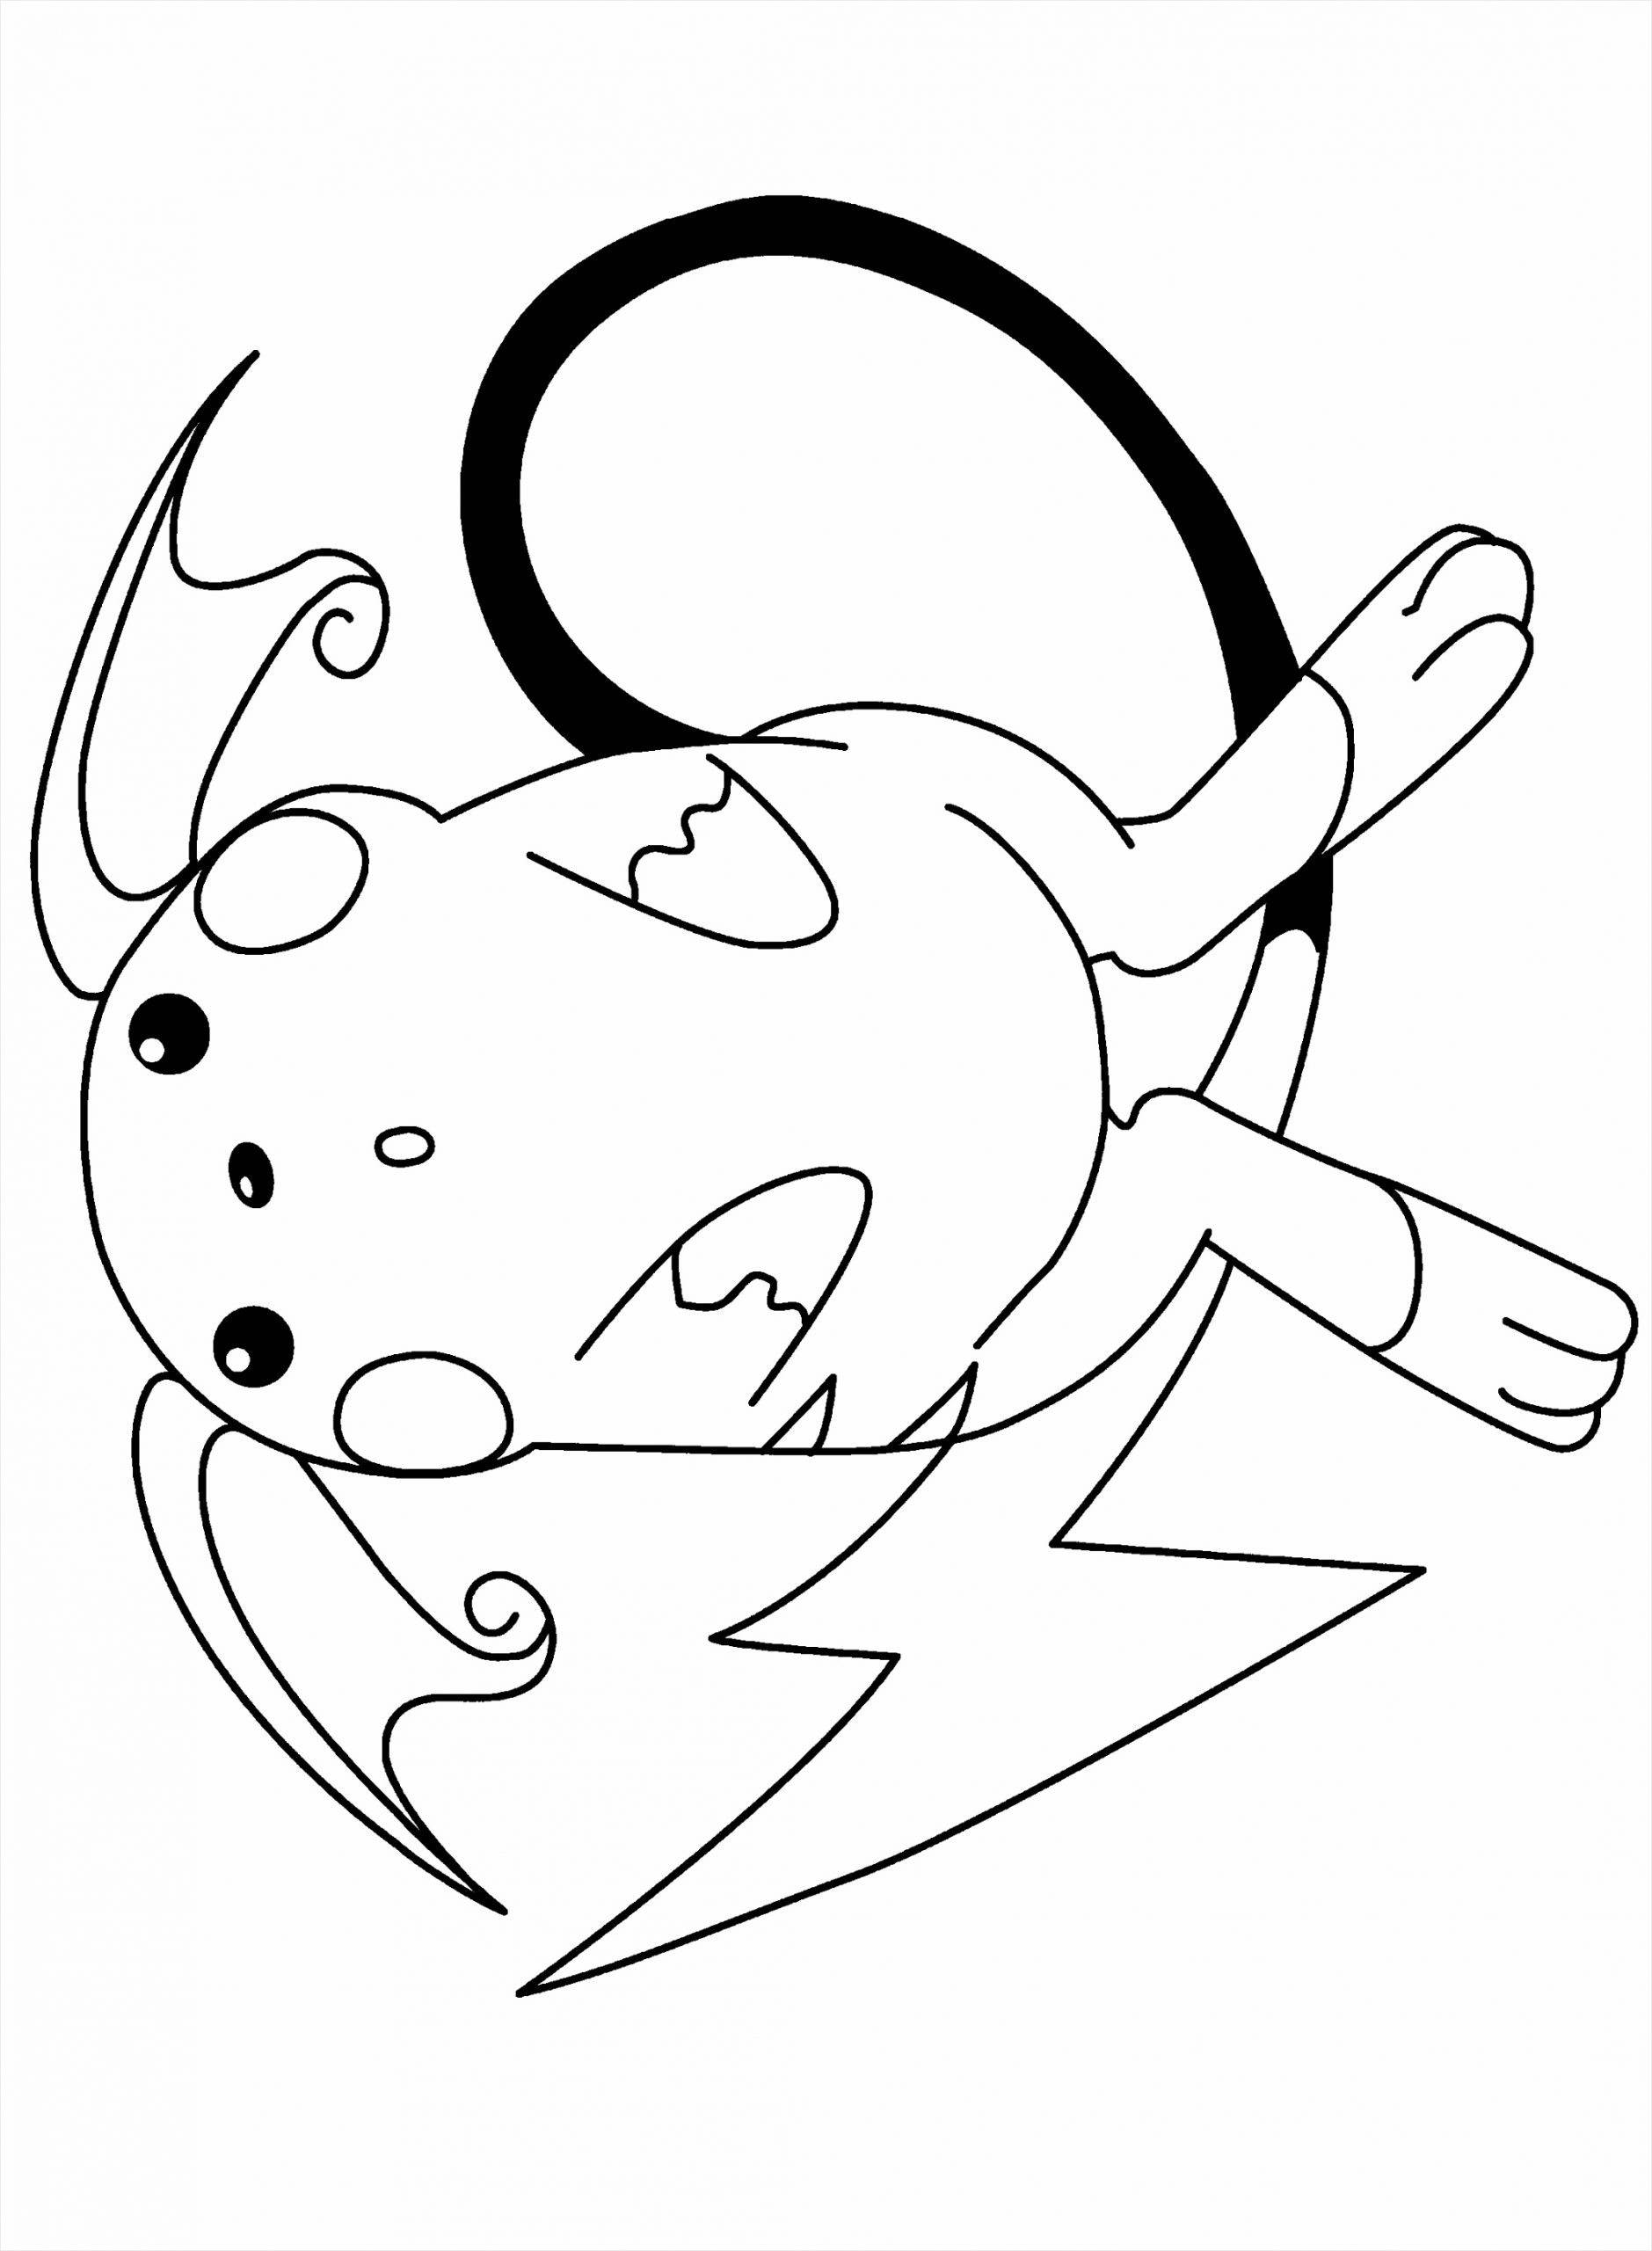 animiertes pokemon ausmalbild malvorlage bild 0048 raypr